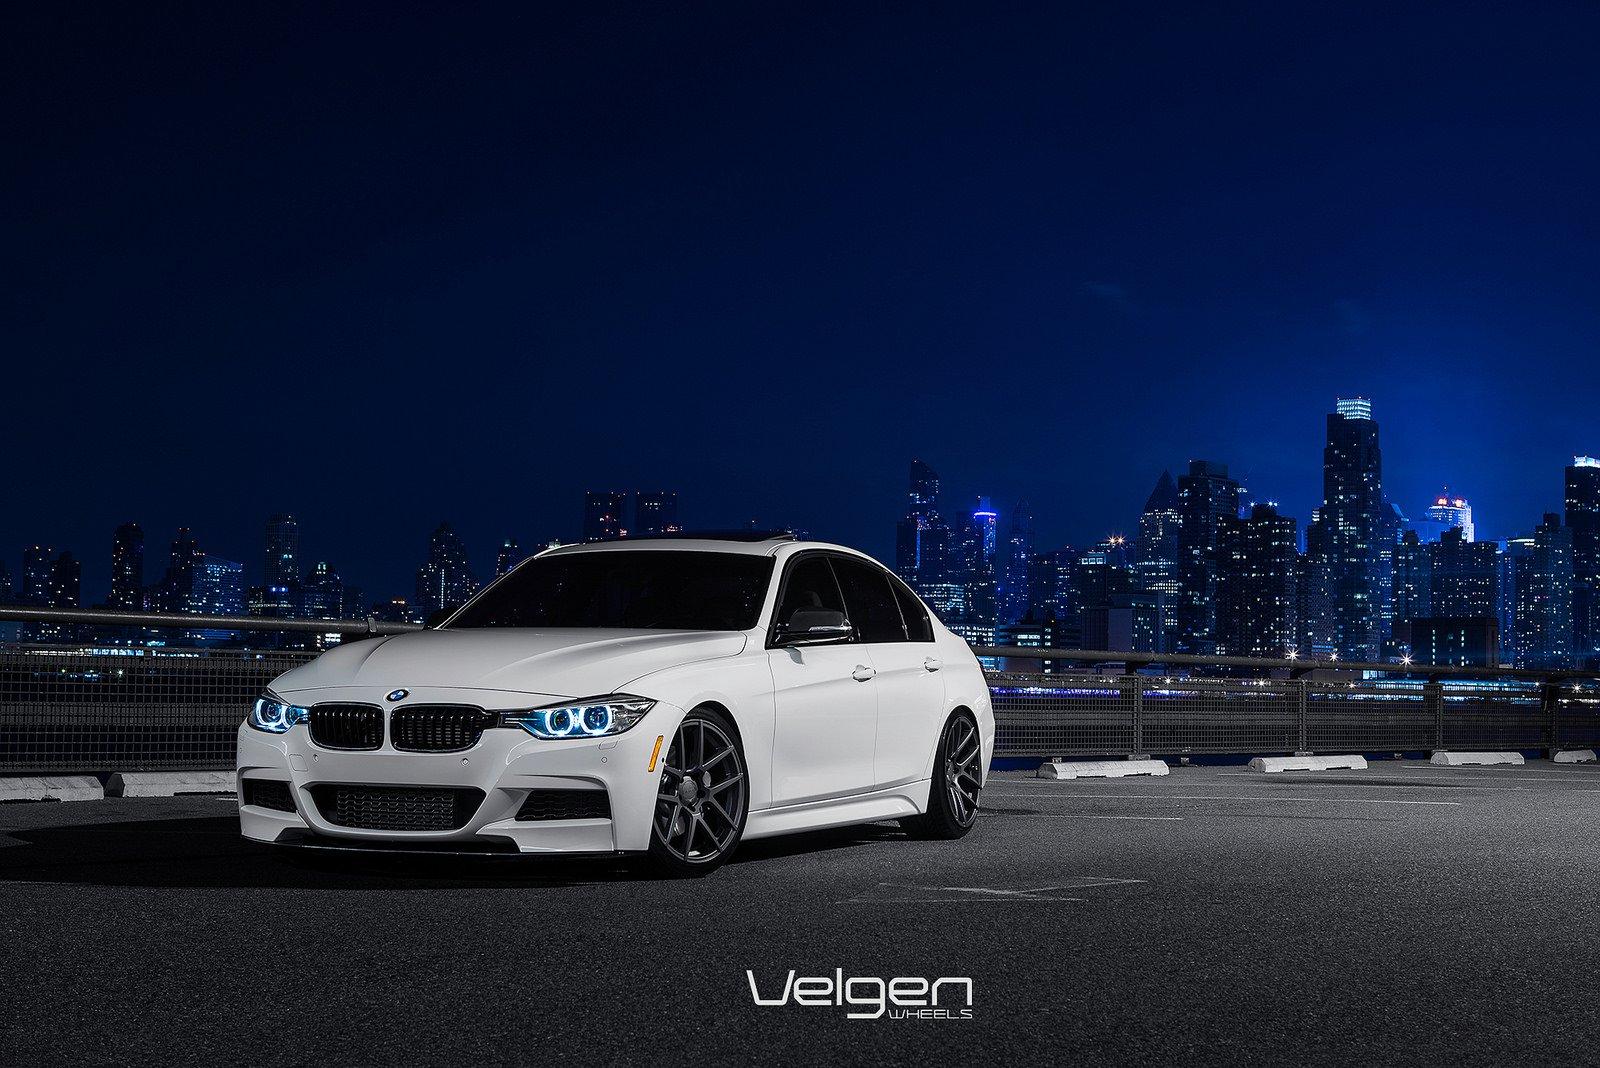 Bmw White Cars Wallpapers Bmw F30 Cars Tuning Velgen Wheels Wallpaper 1600x1068